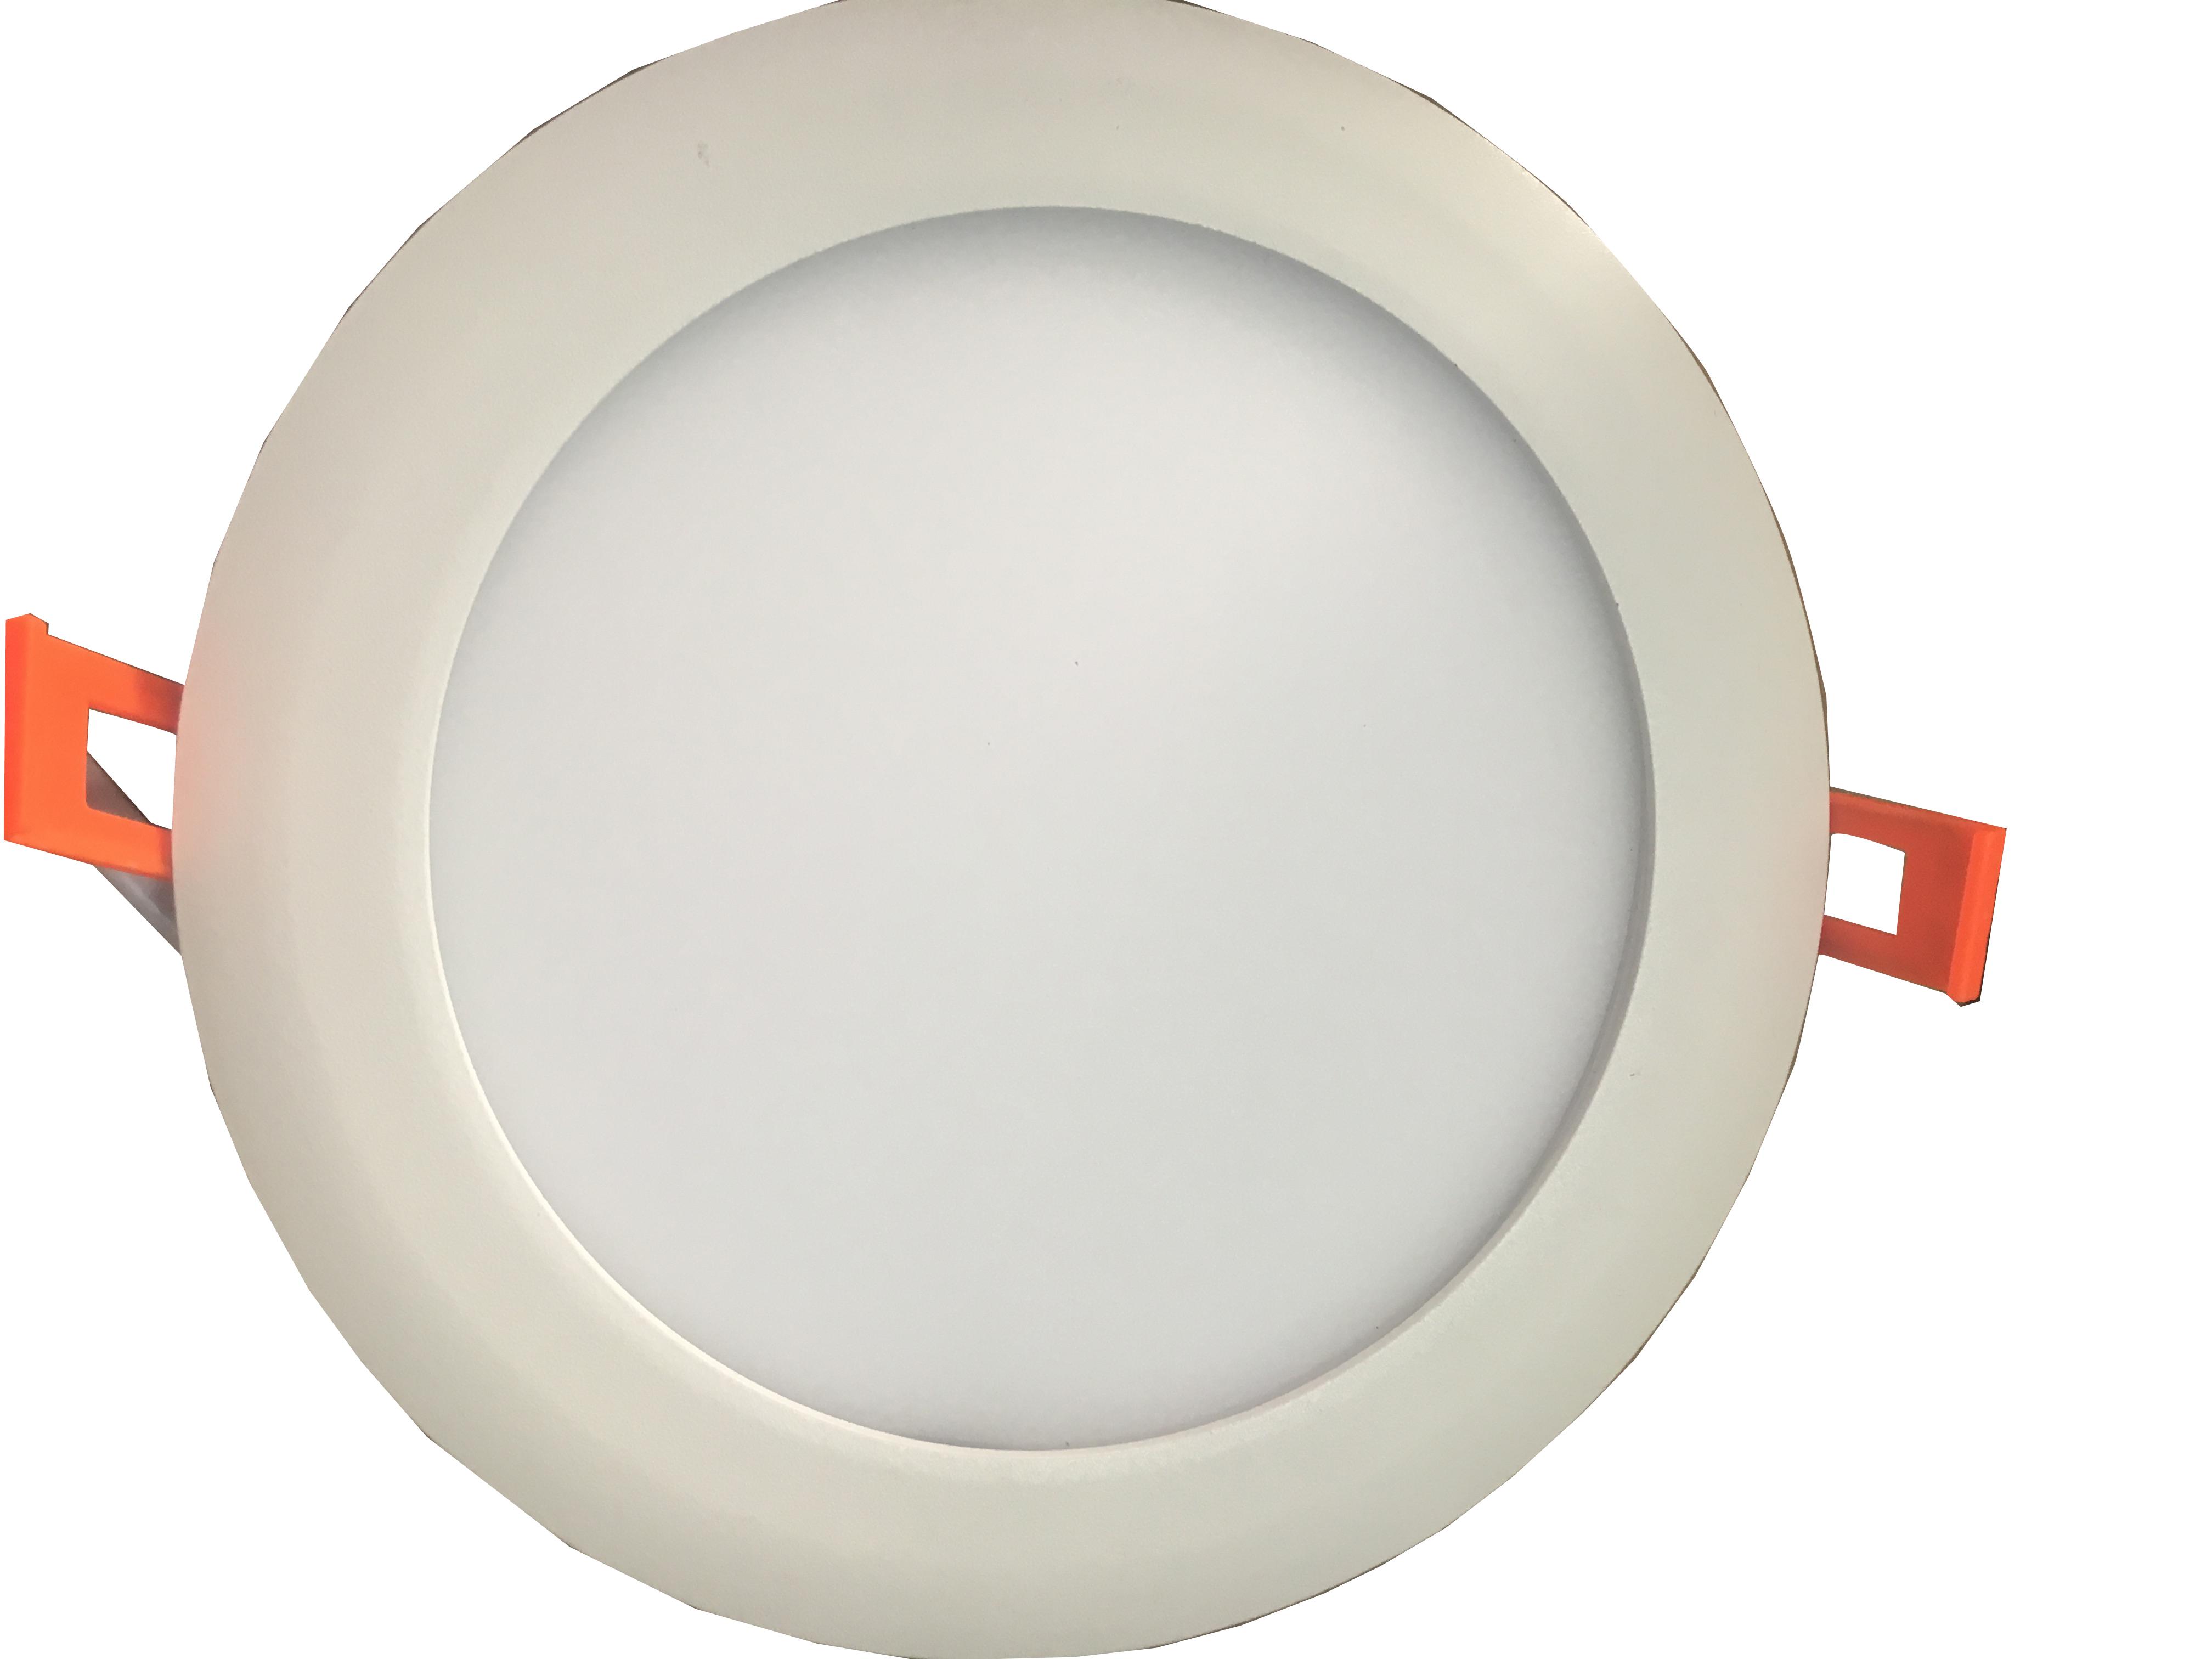 LED Downlight Slim Downlight Round Downlight